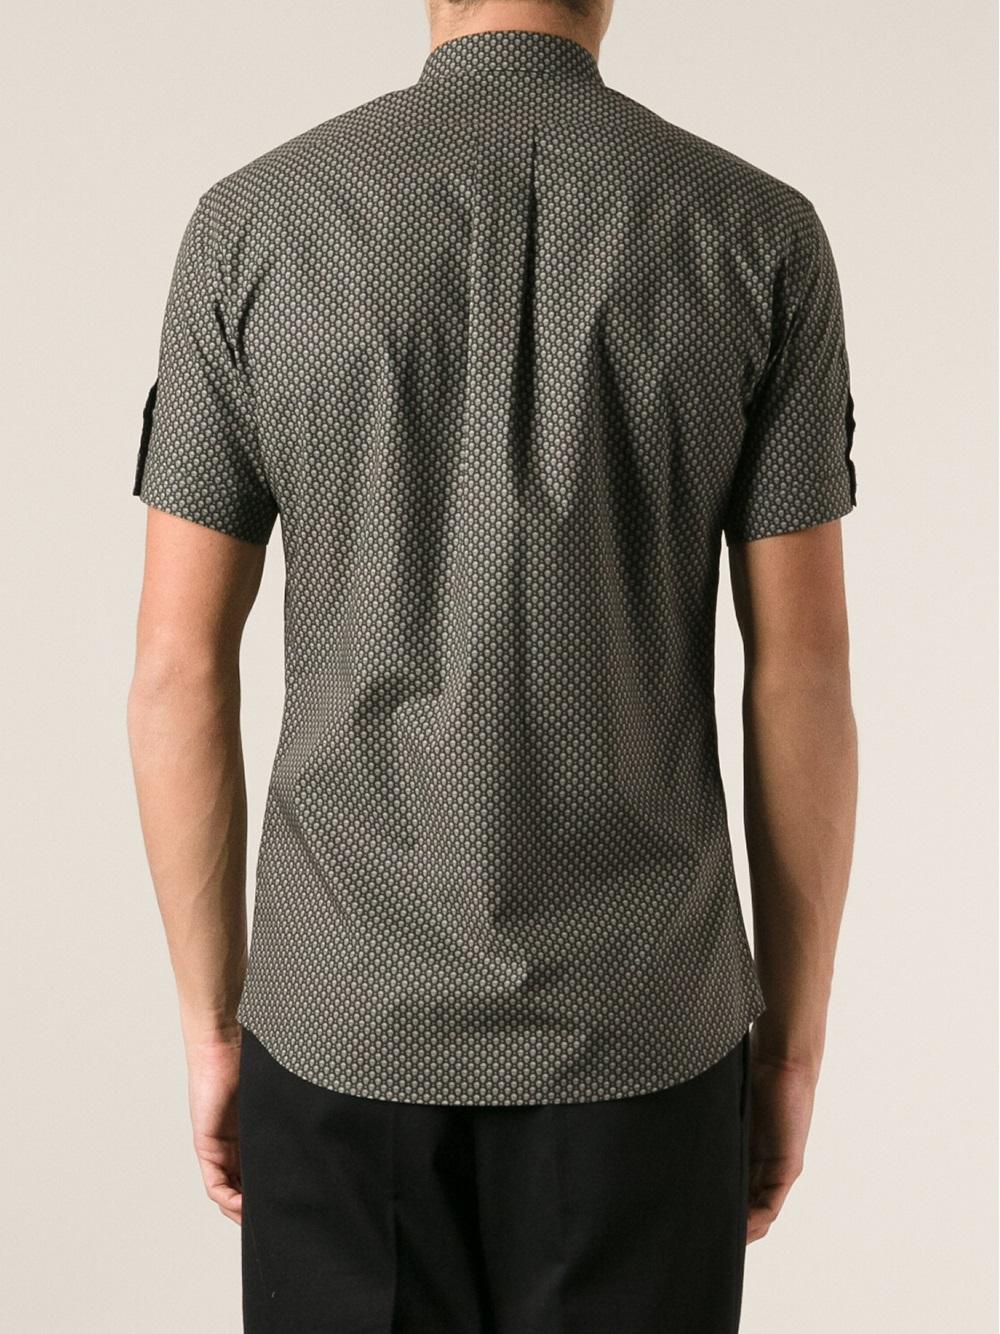 Lyst alexander mcqueen skull print shirt in black for men for Alexander mcqueen shirt men